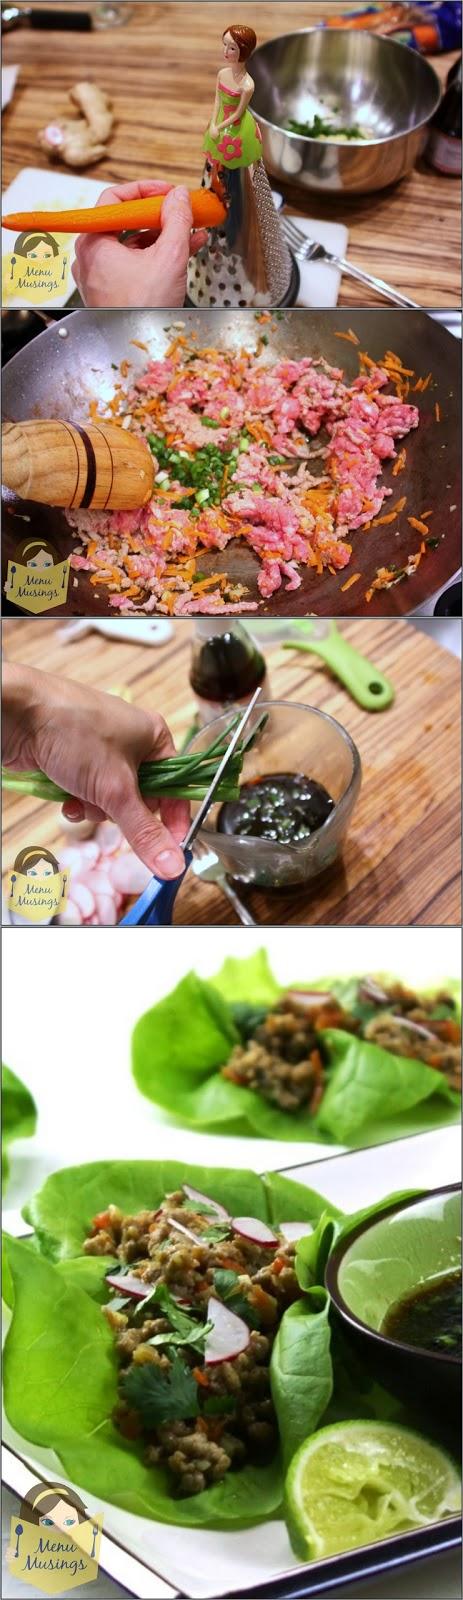 http://menumusings.blogspot.com/2013/01/vietnamese-style-lettuce-cups.html